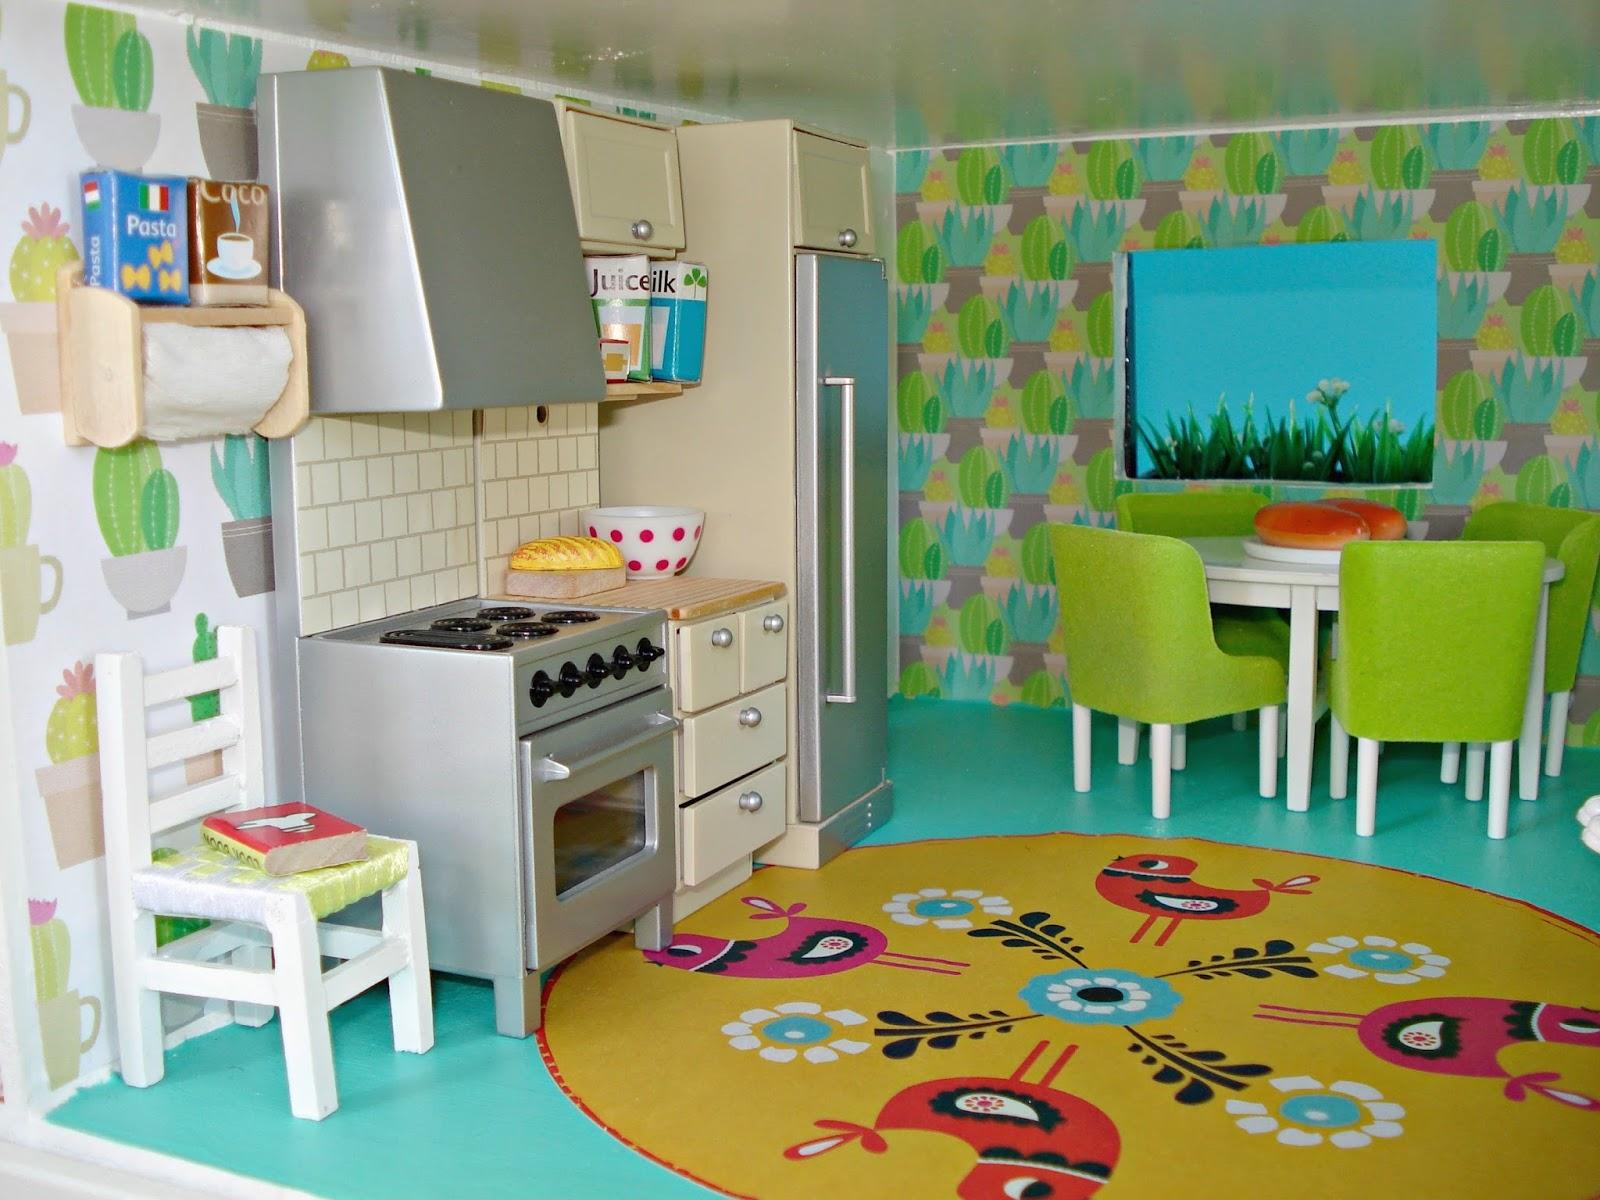 cupcake cutie dolls house makeover the kitchen